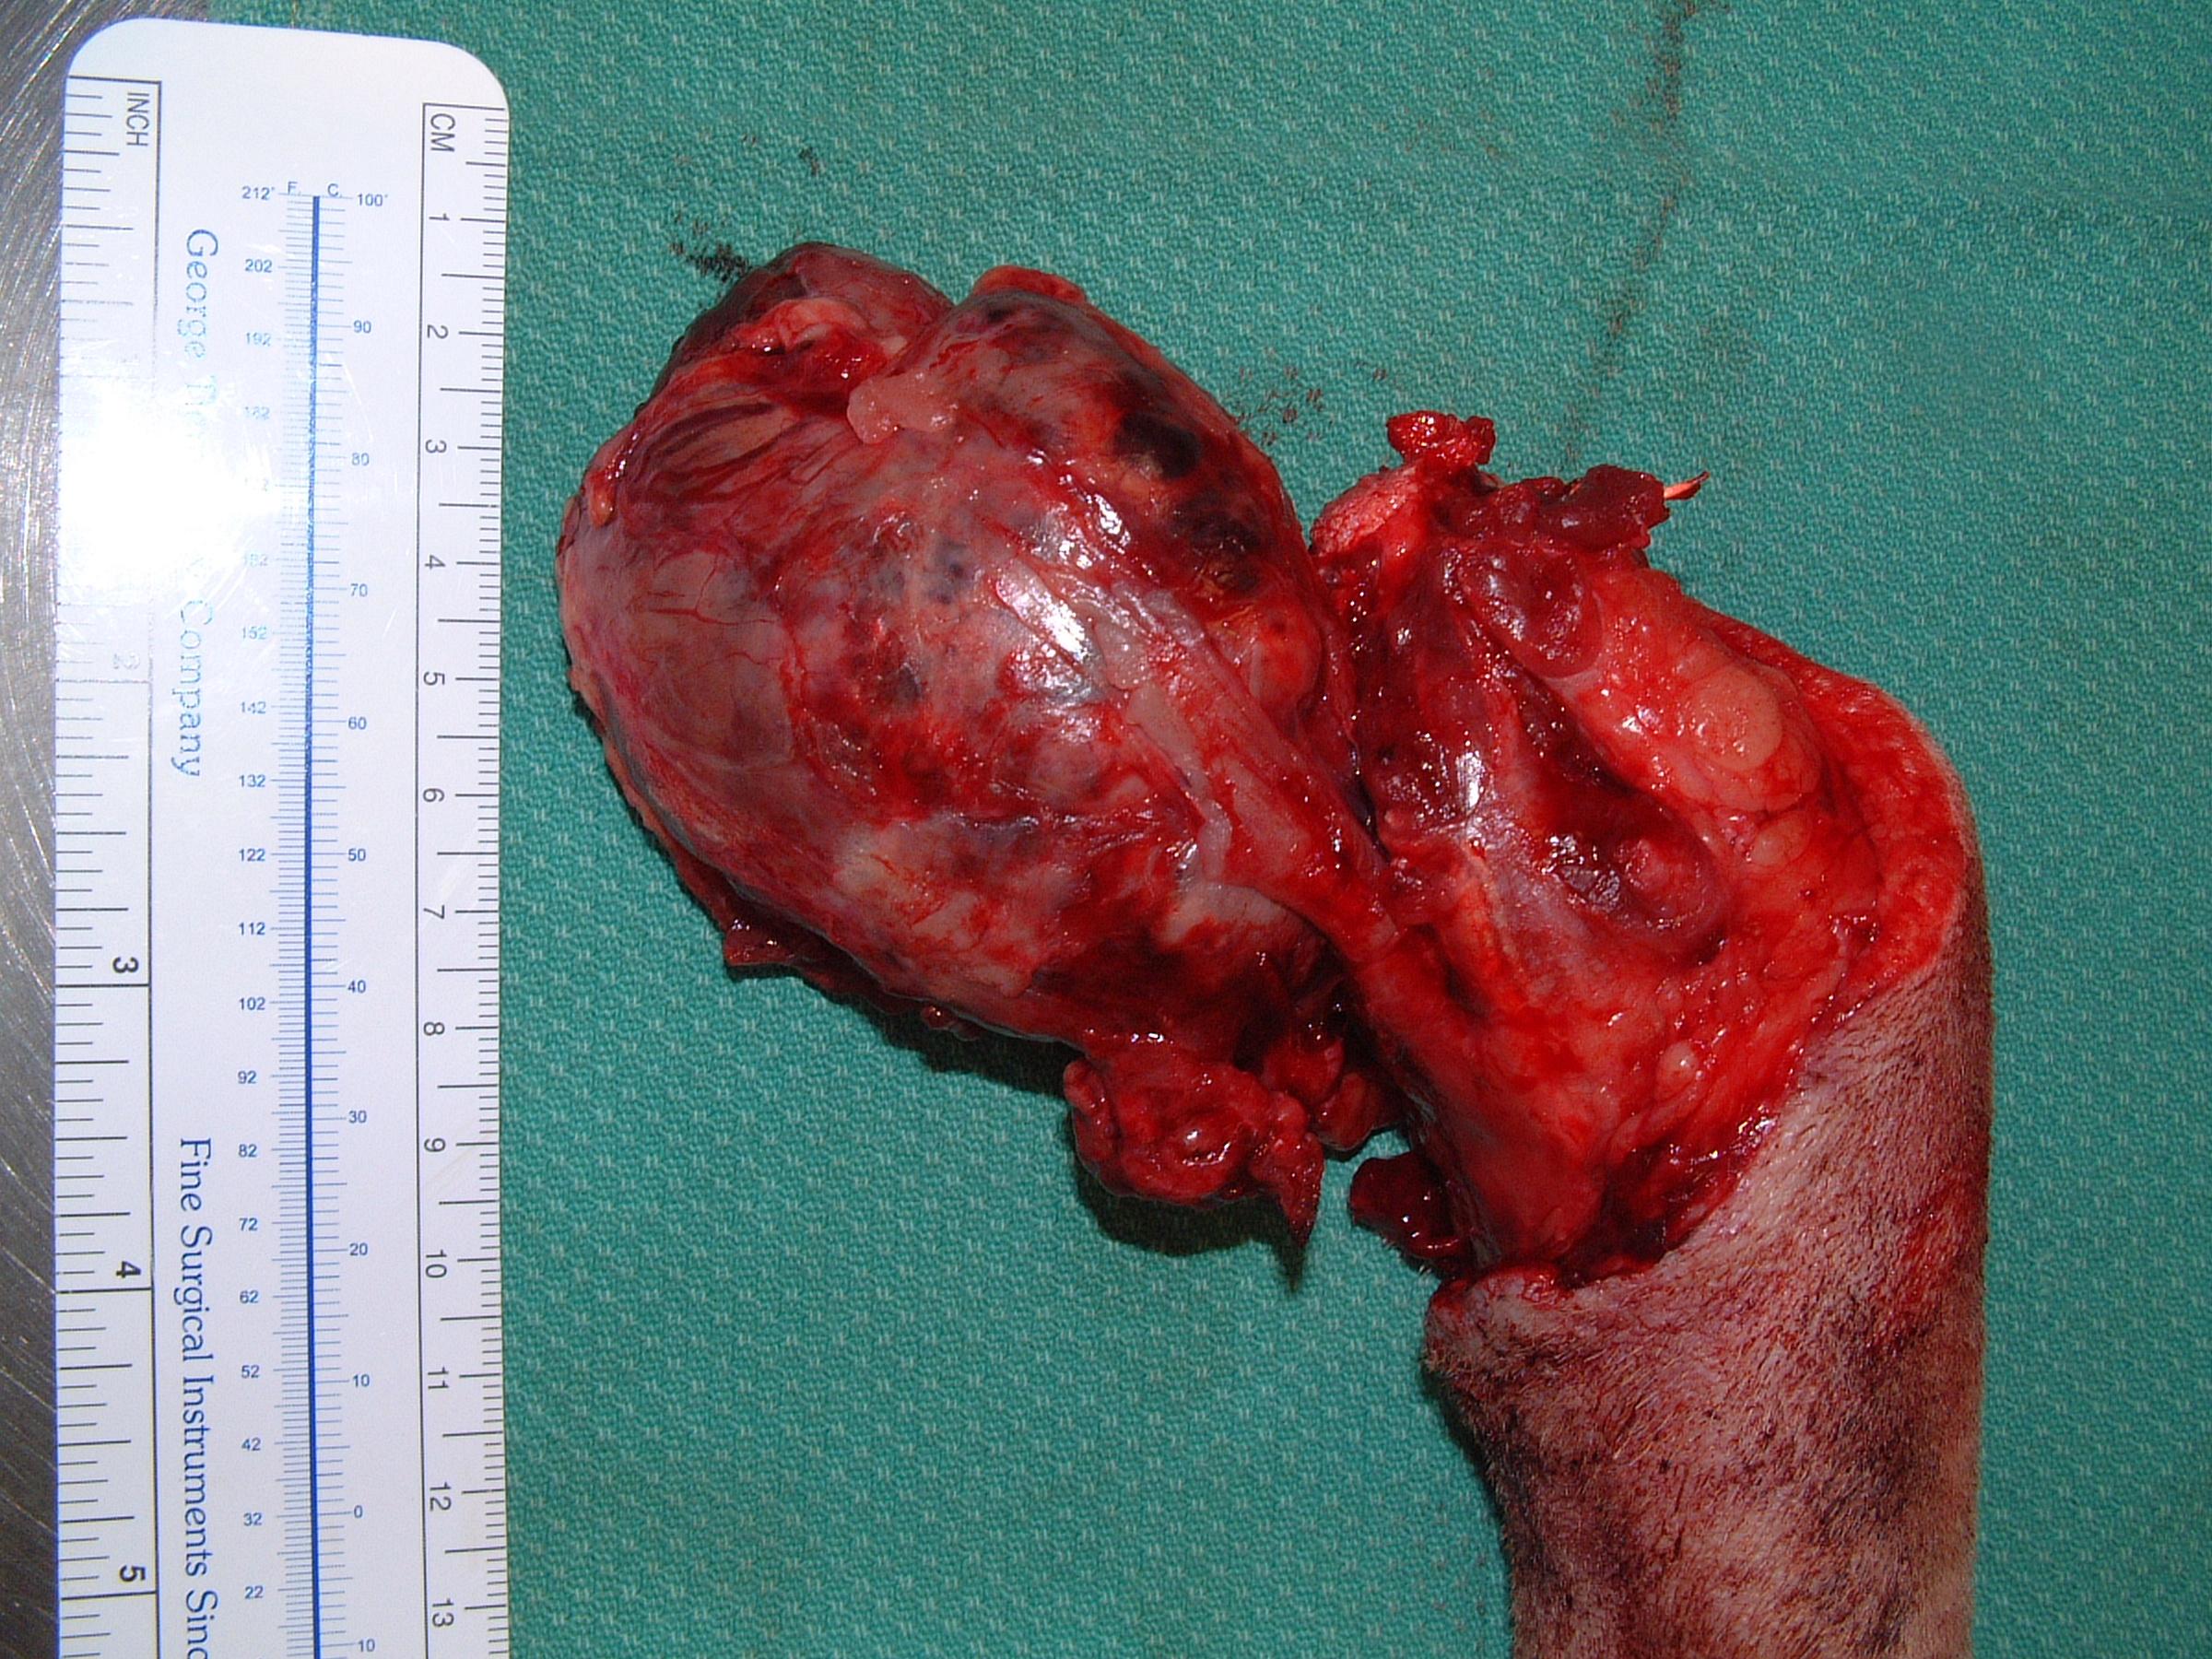 Caudal Vertebral Osteosarcoma